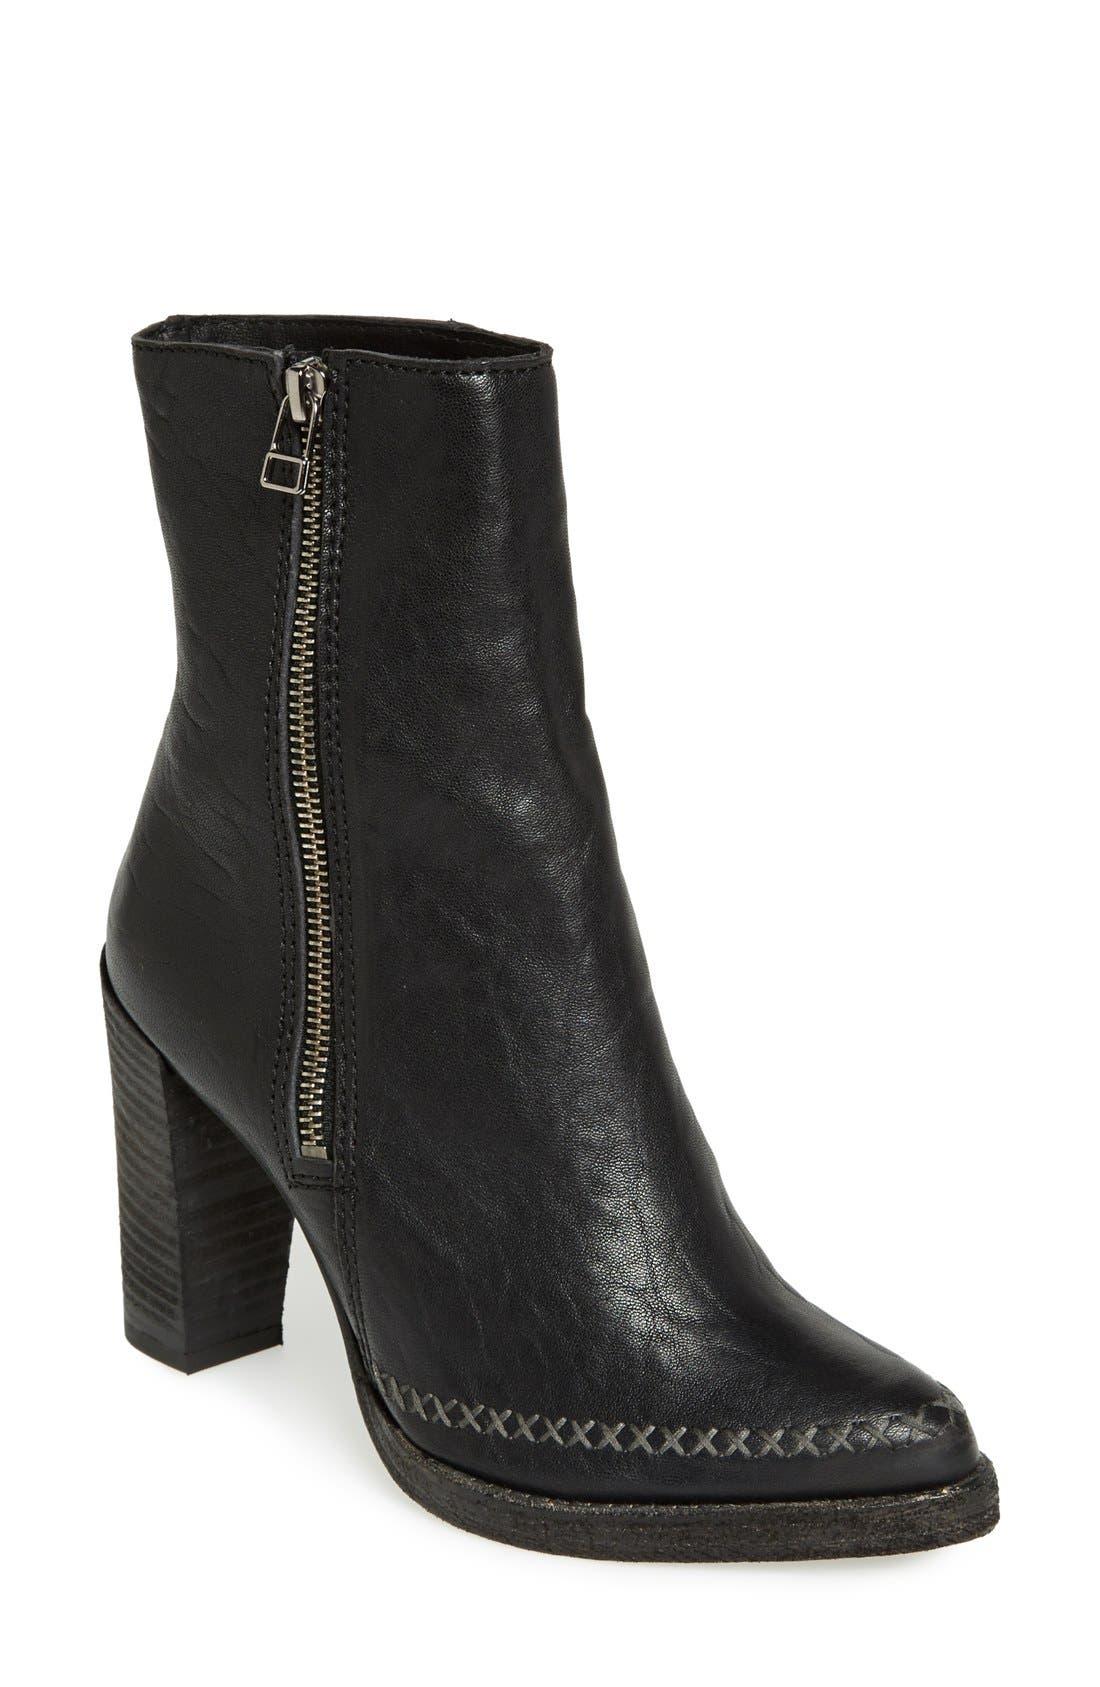 Main Image - Free People 'Baroness' Side Zip Boot (Women)